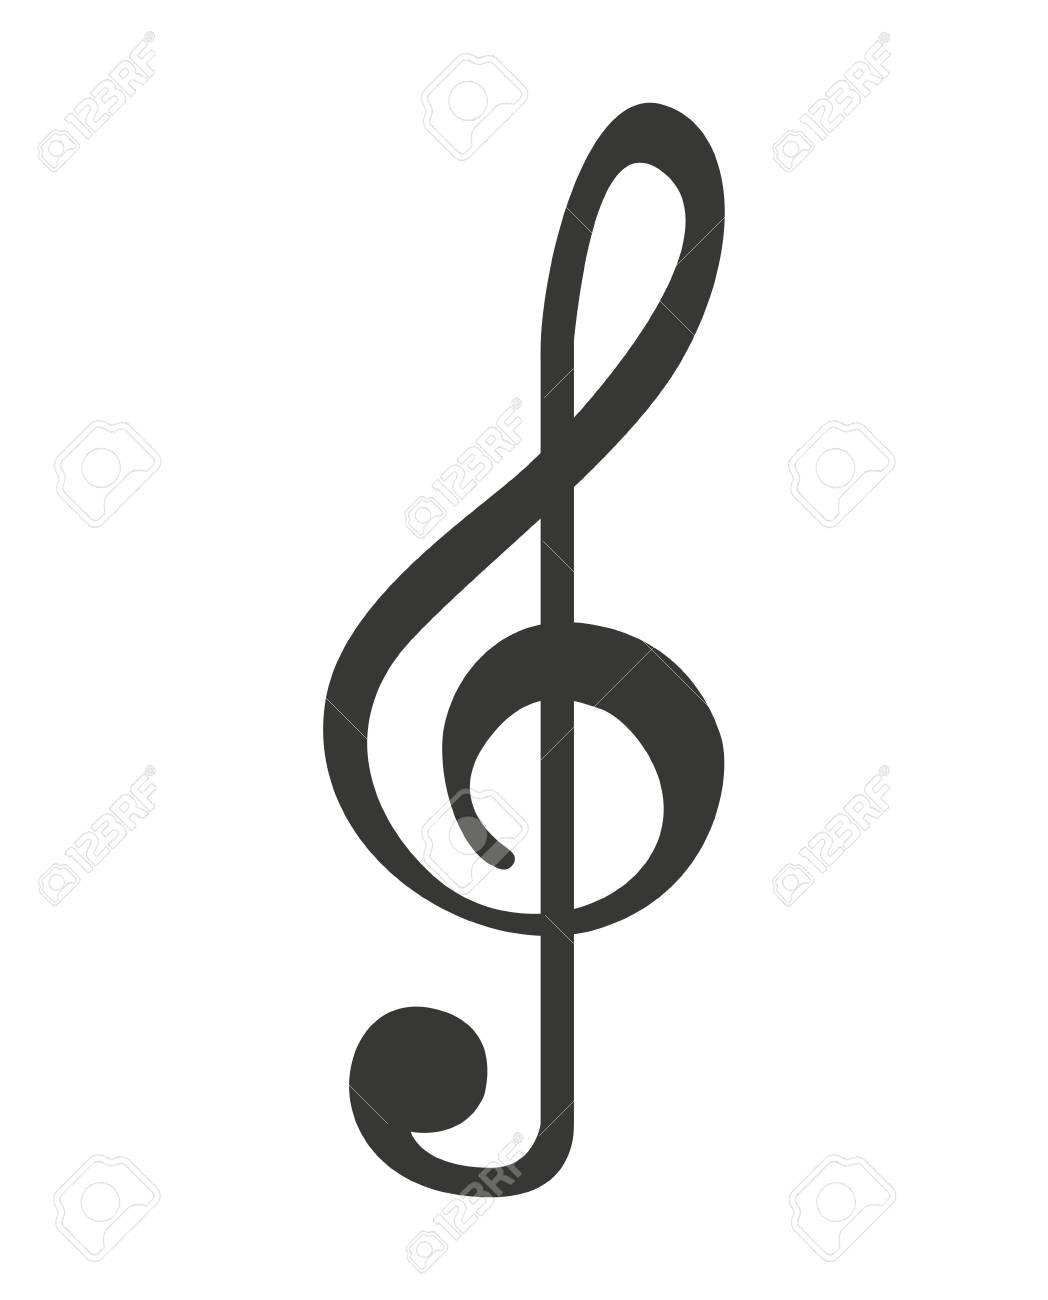 Note De Musique Isole Dessin Icone Illustration Vectorielle